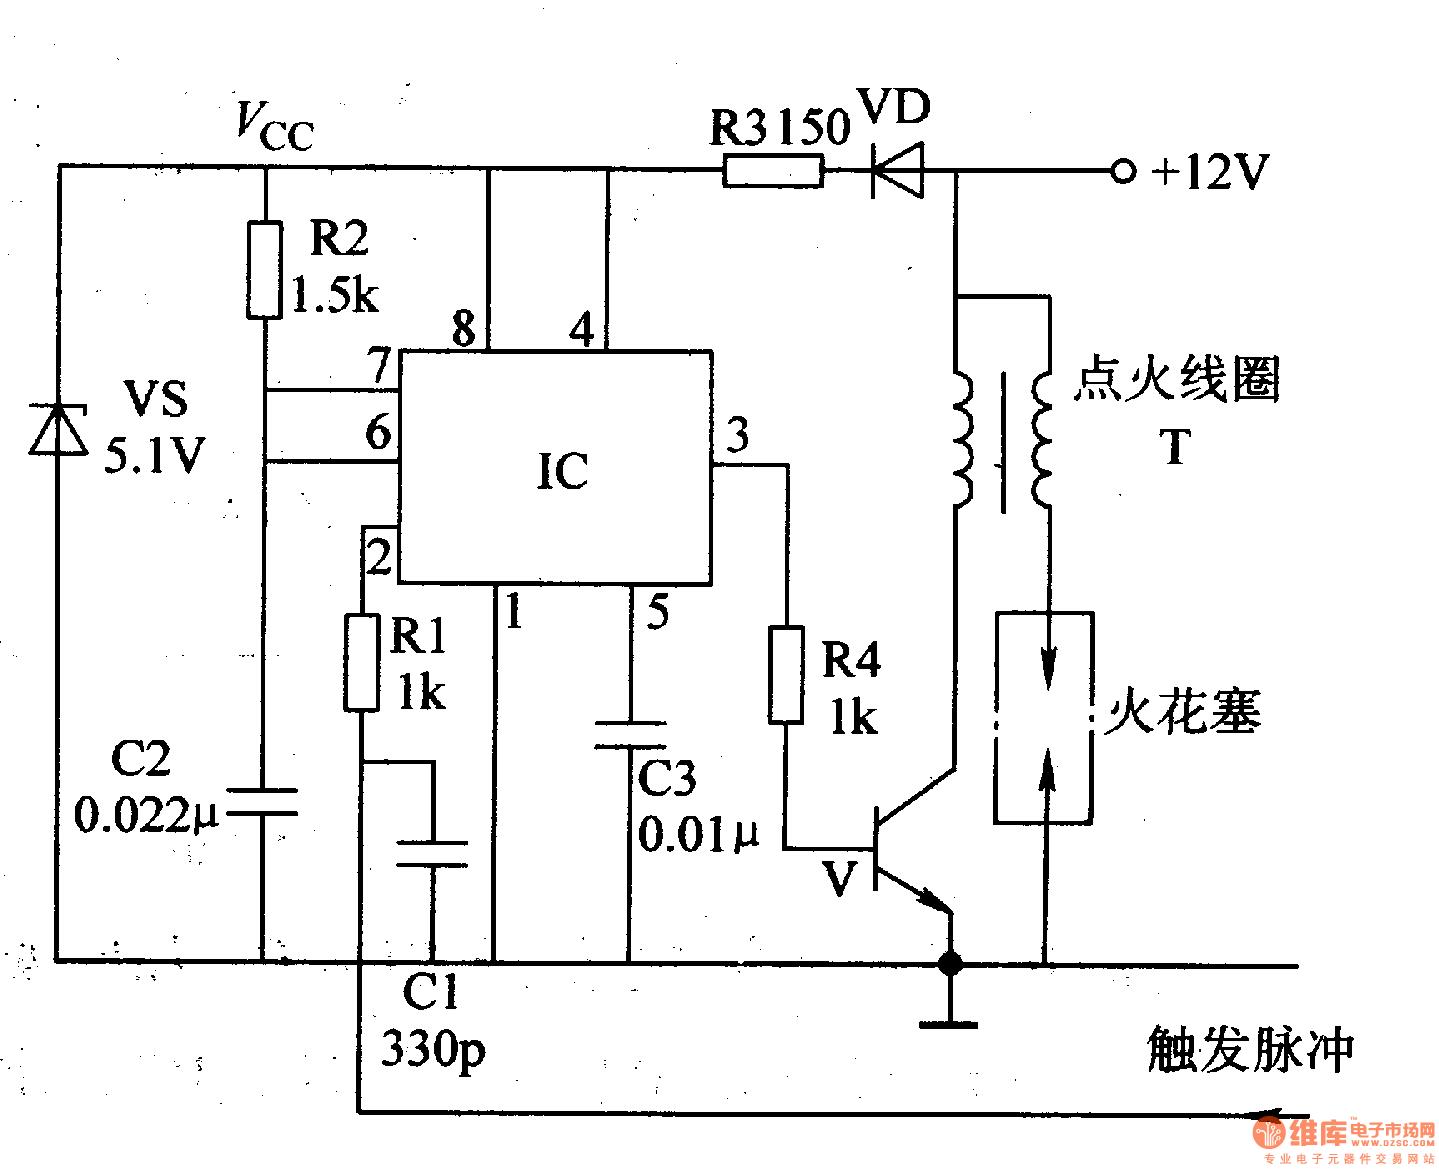 electronic ignition circuit diagram wiring diagram perfomance motorcycle electronic ignition 1 electronics electronics mallory [ 1439 x 1169 Pixel ]